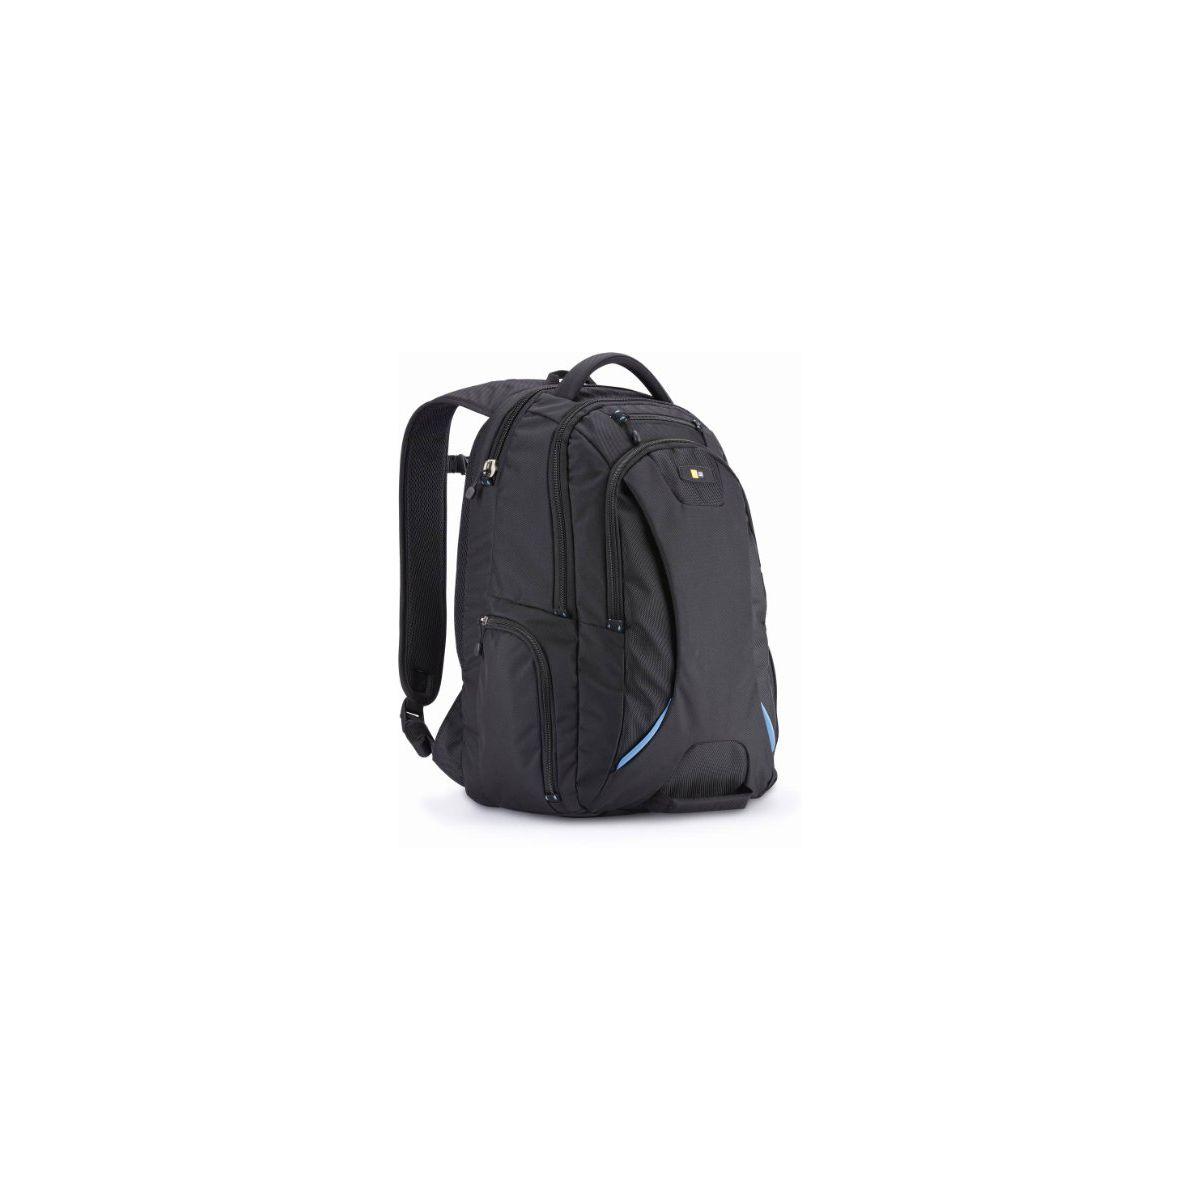 Sac � dos caselogic nylon gamme premium 13 � 16'' noir - livraison offerte : code prem